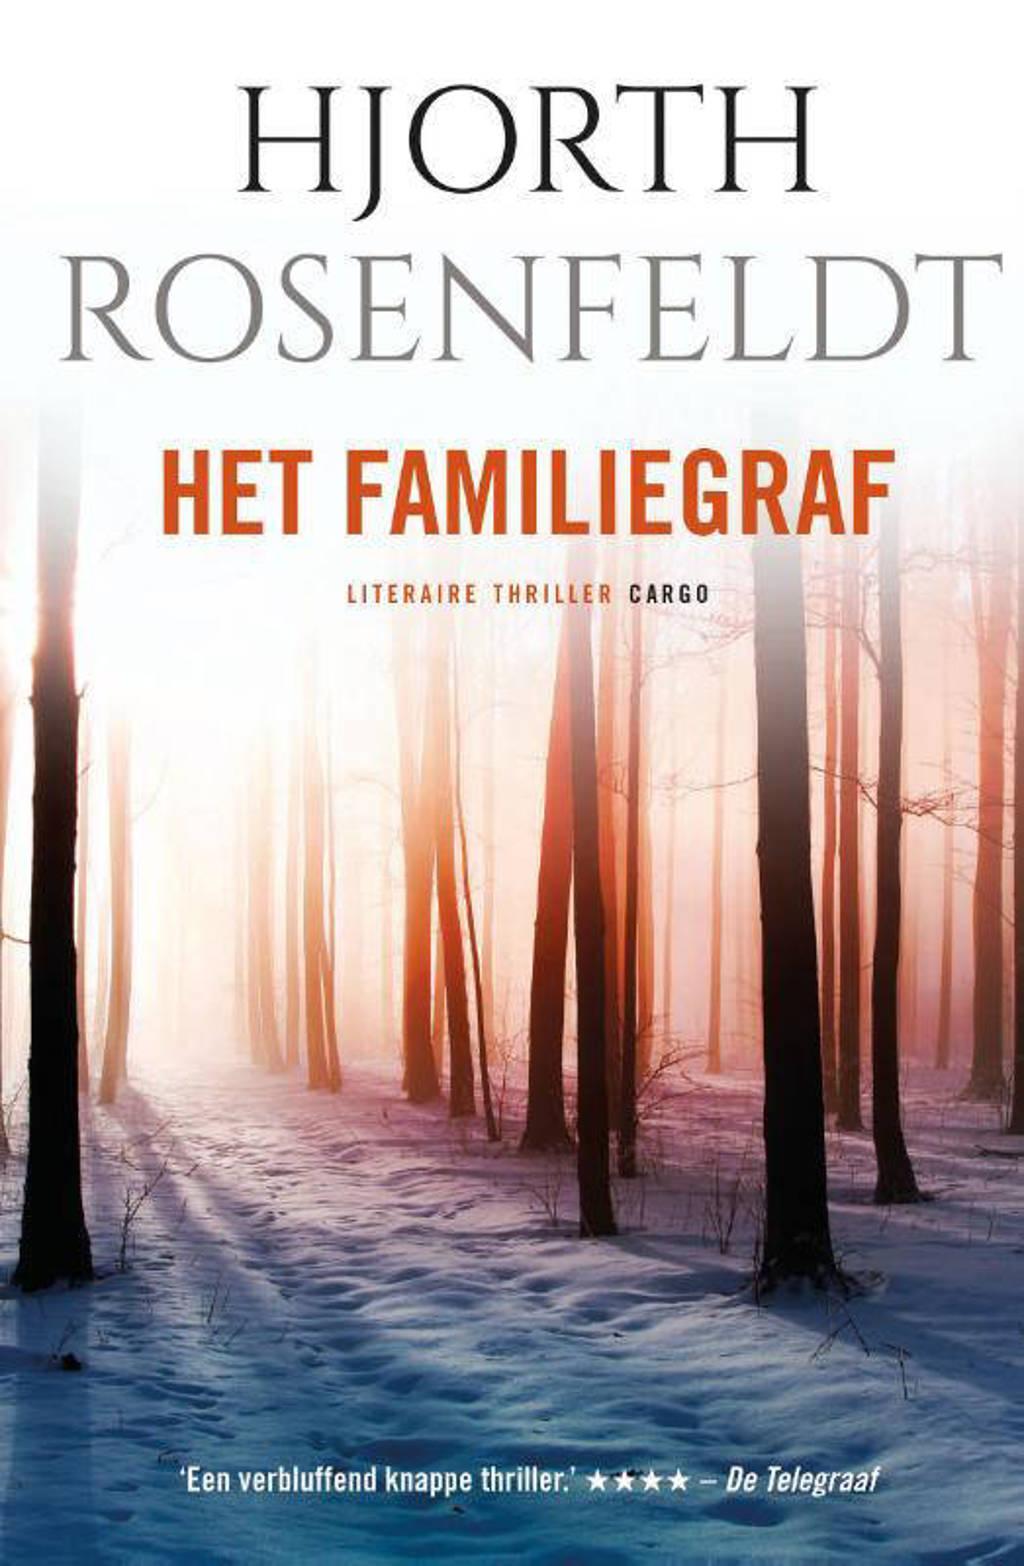 Bergmankronieken: Het familiegraf - Hjorth Rosenfeldt